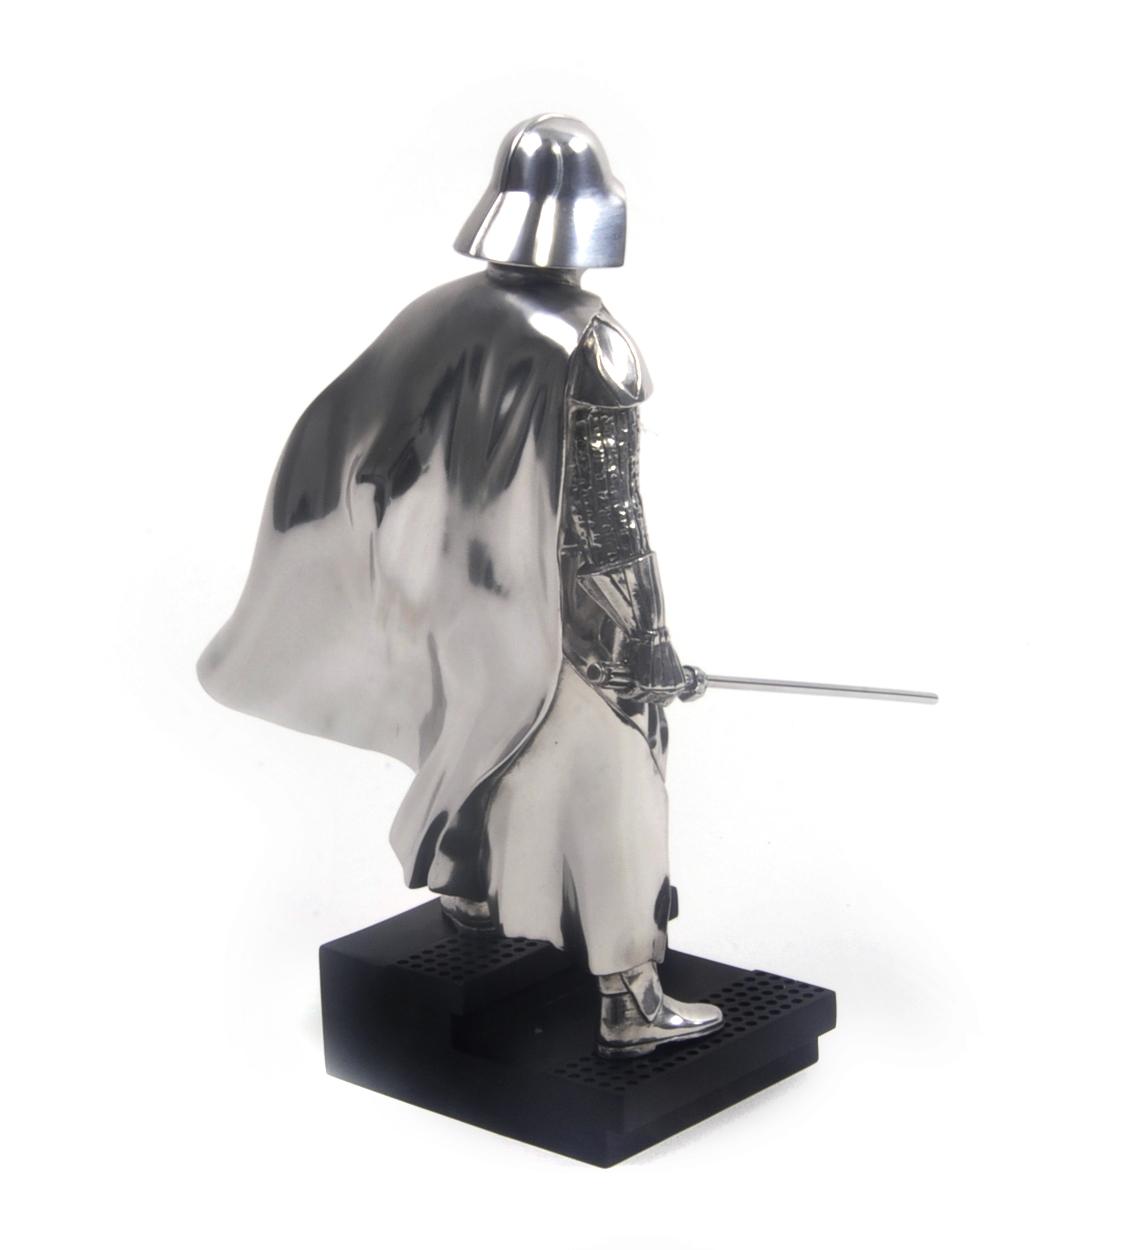 darth vader star wars limitierte edition figur by royal. Black Bedroom Furniture Sets. Home Design Ideas